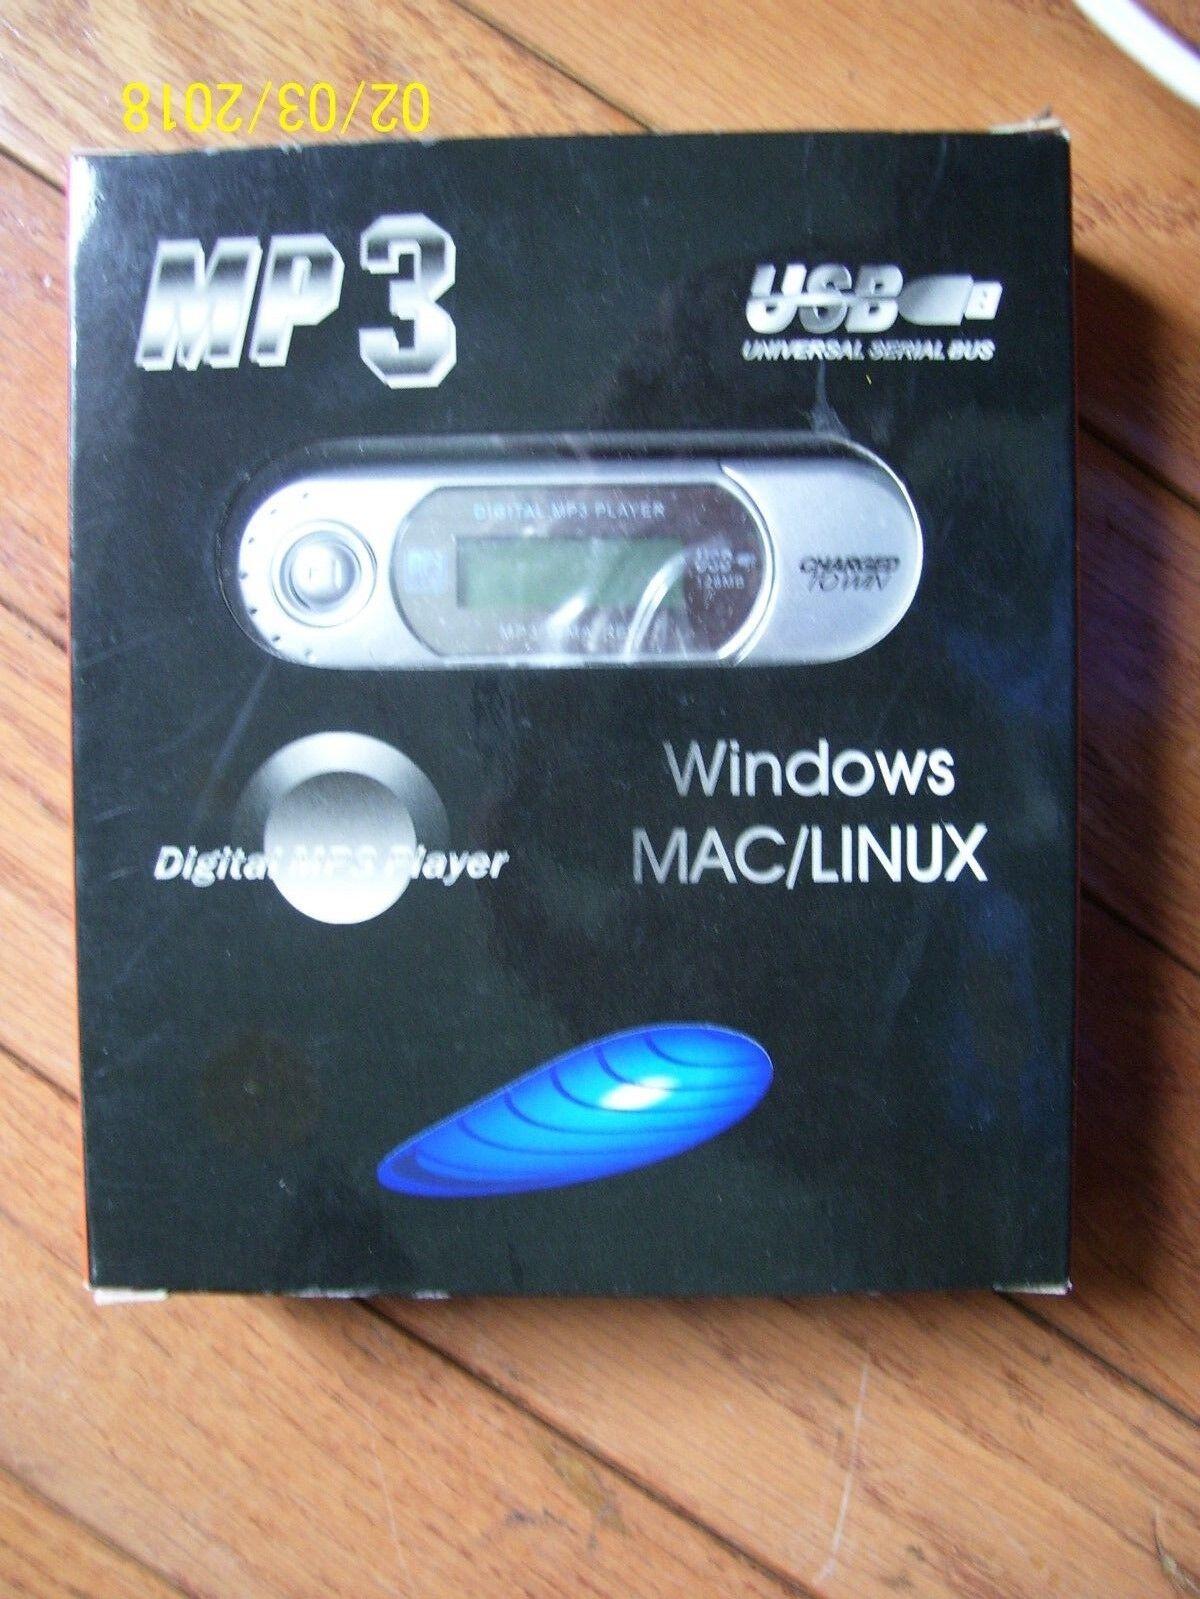 brand new digital mp3 player windows mac